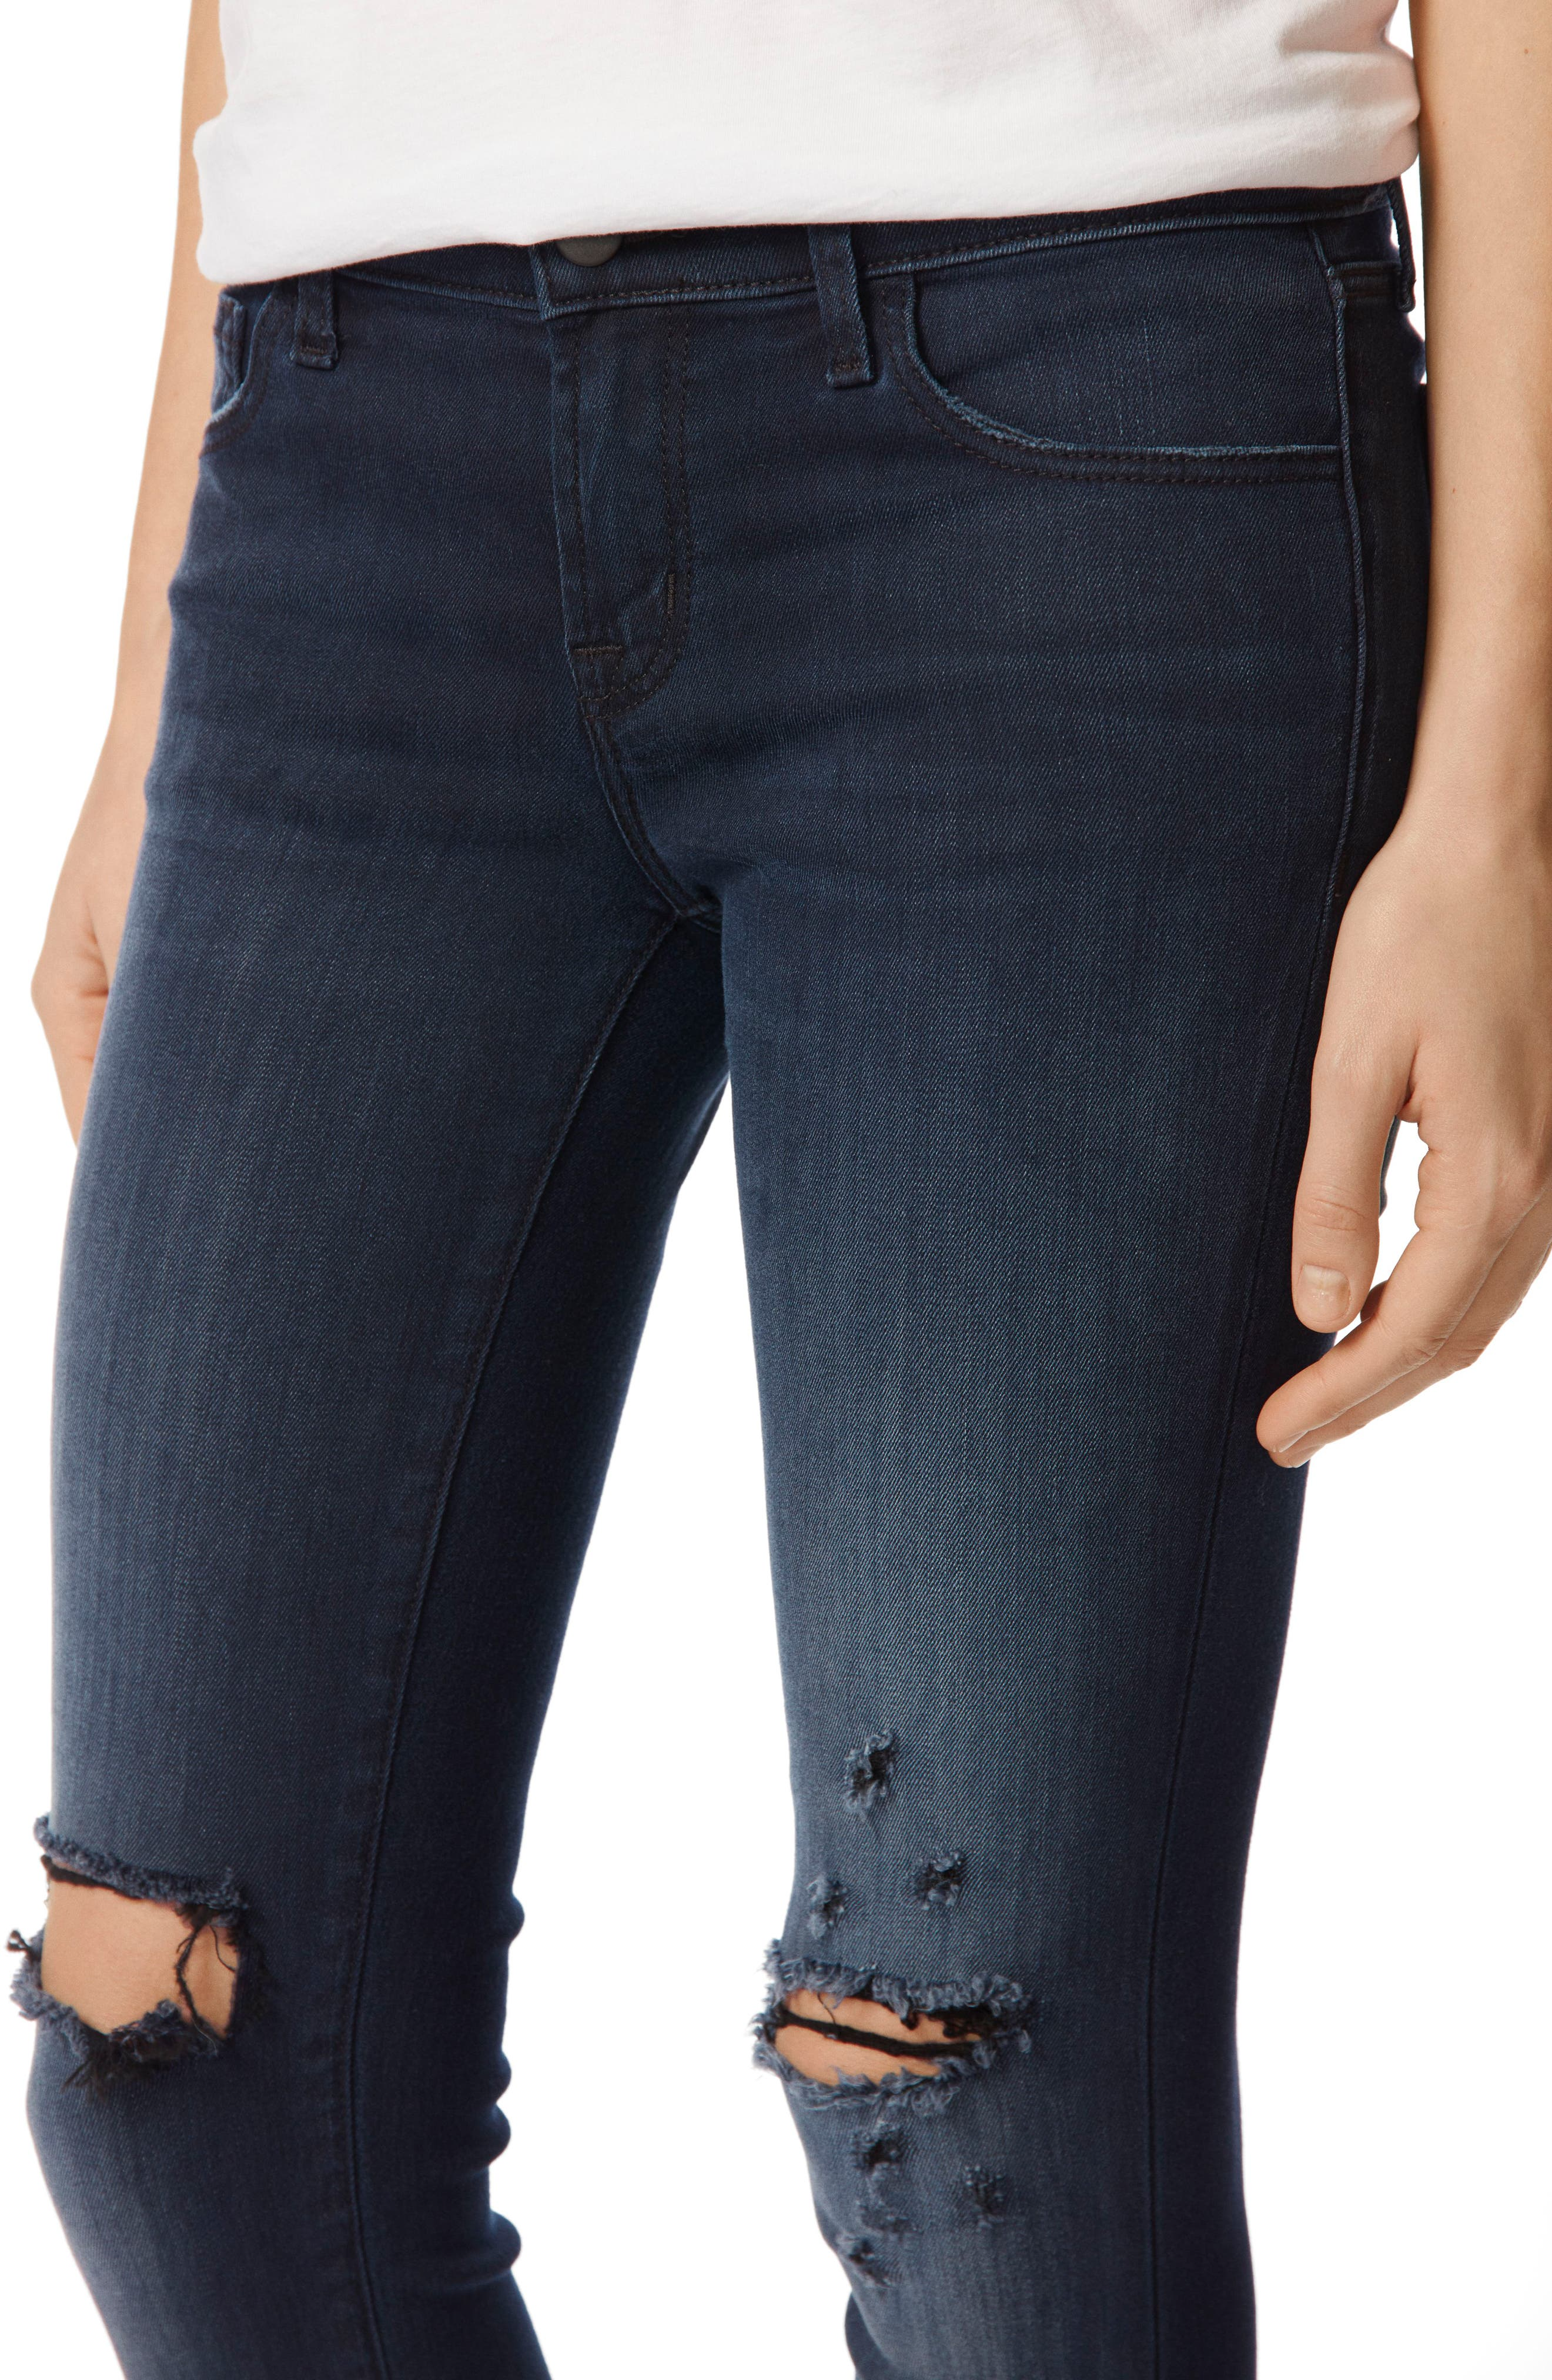 9326 Low Rise Crop Skinny Jeans,                             Alternate thumbnail 4, color,                             Black Sea